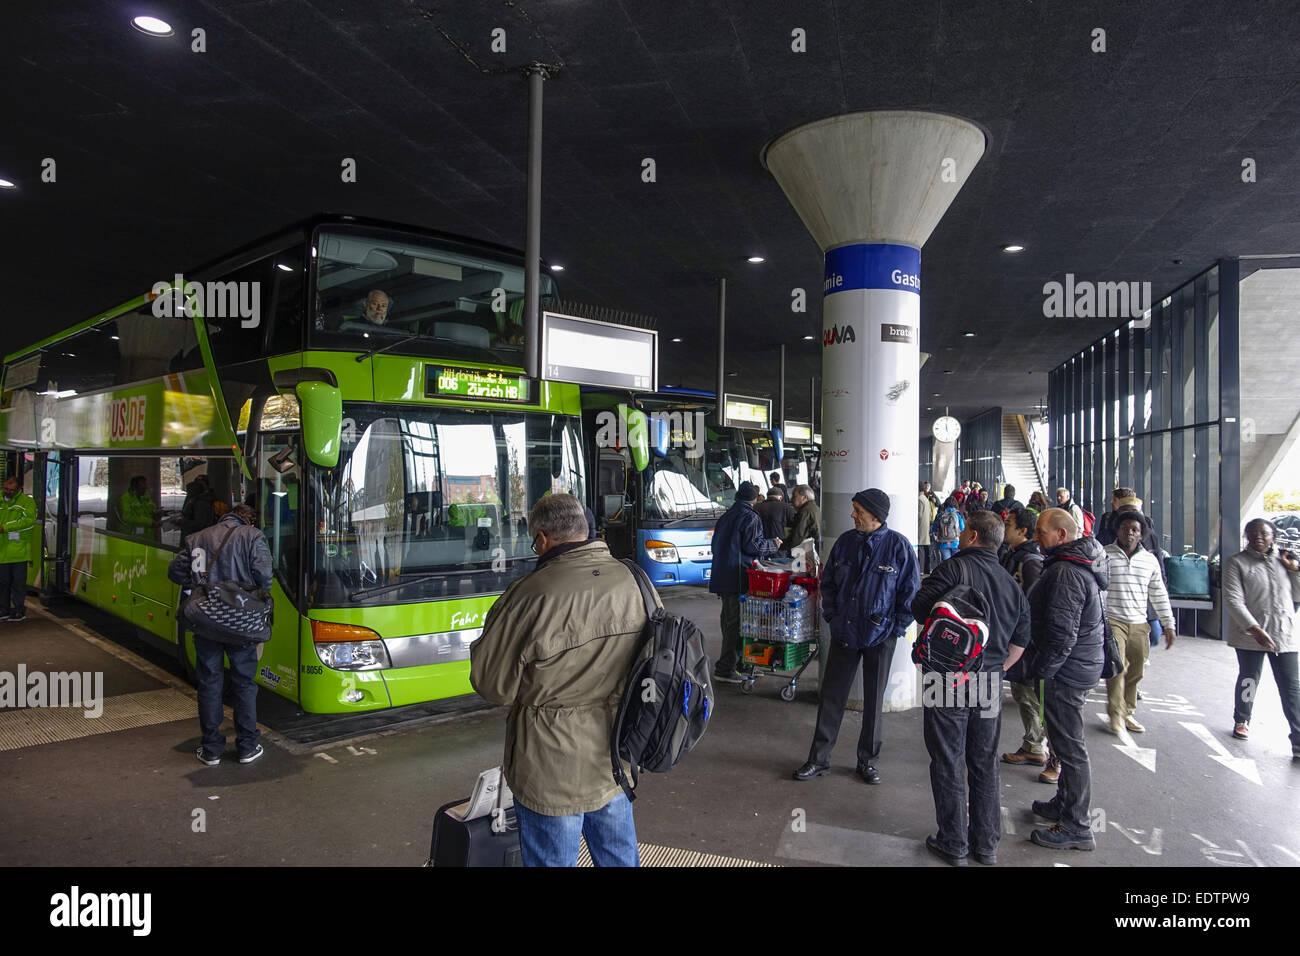 Zentraler Omnibusbahnhof, ZOB, München, Oberbayern, Bayern, Deutschland, Europa,Zentraler Omnibusbahnhof, Central - Stock Image